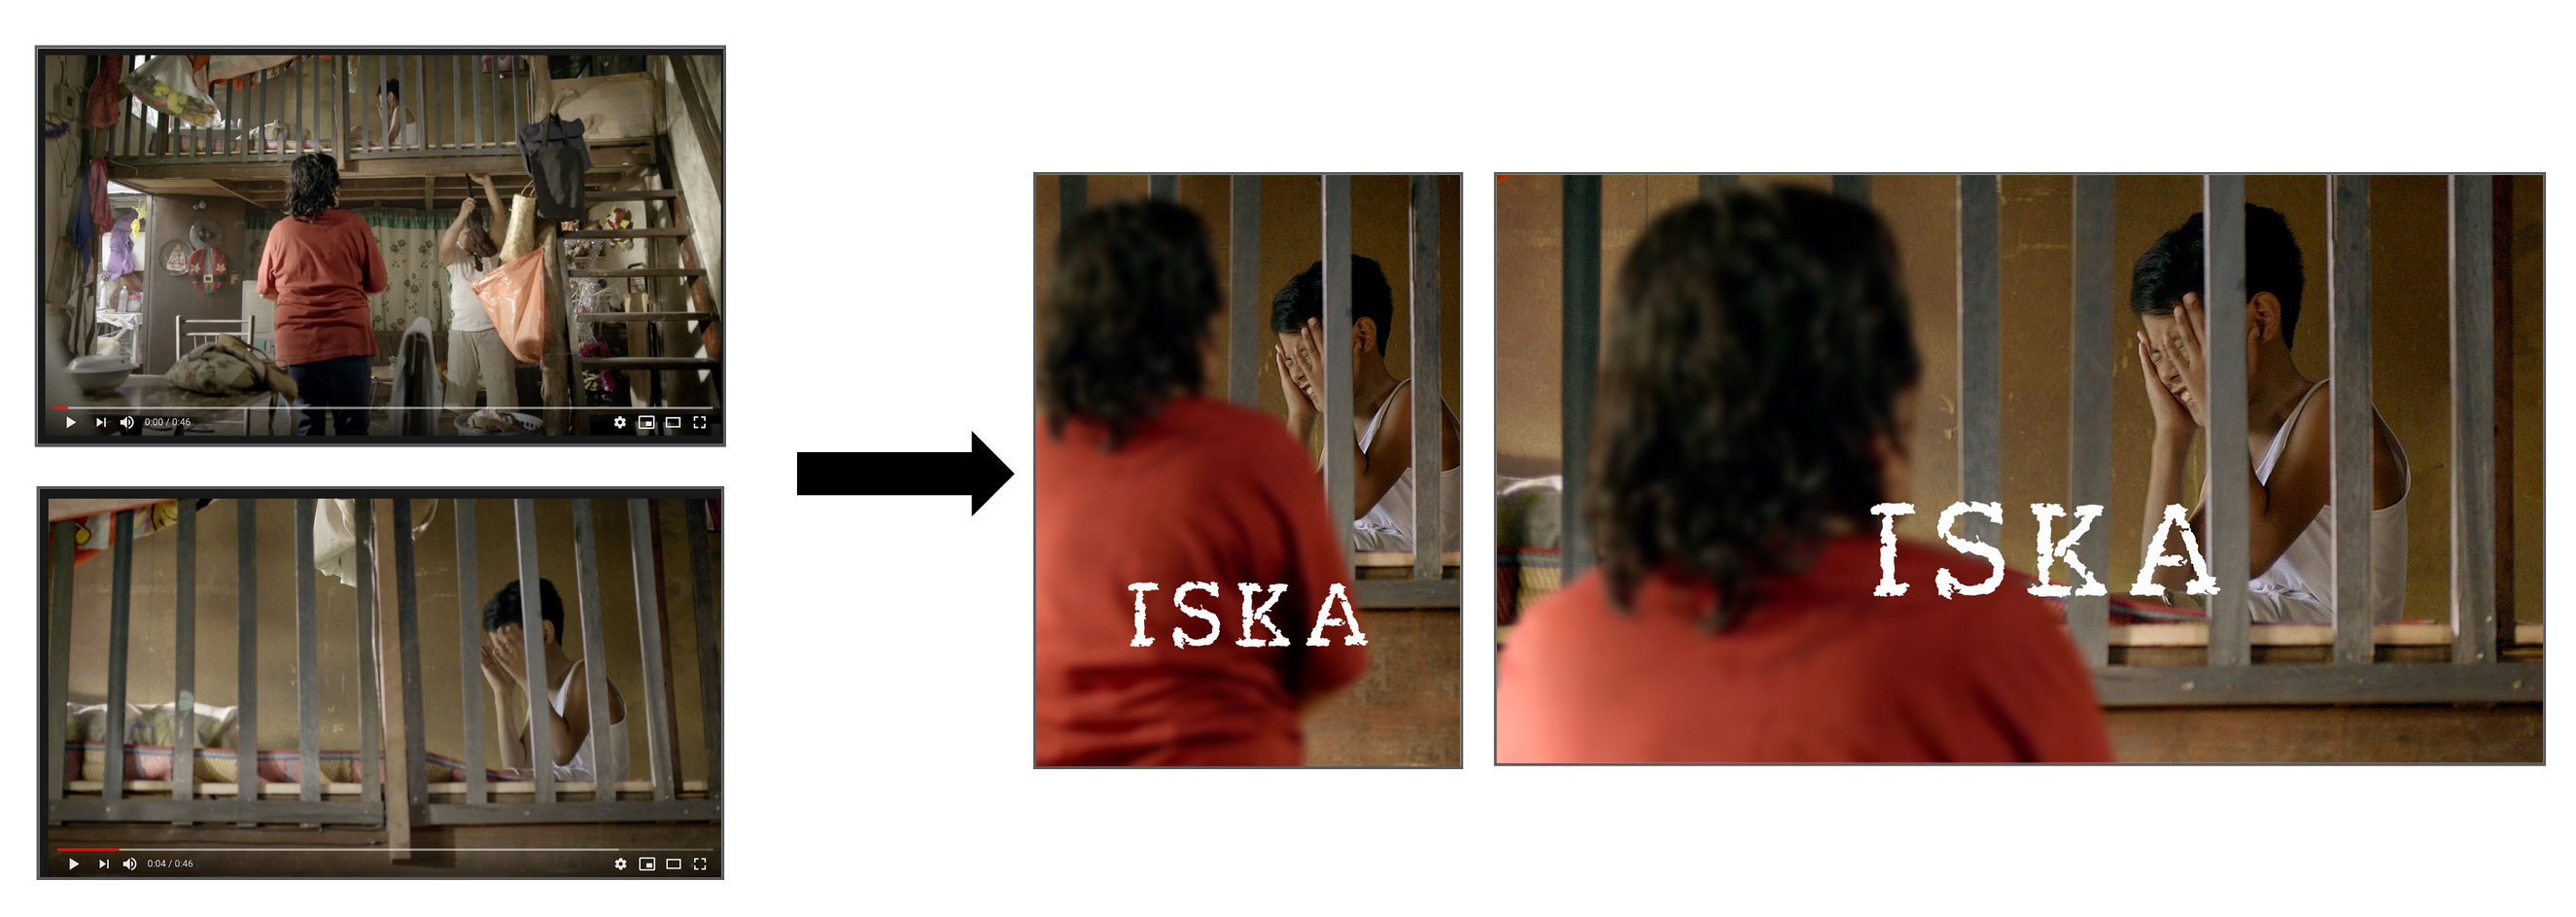 Trailer Frame (not exact) → Boxshot, SDP